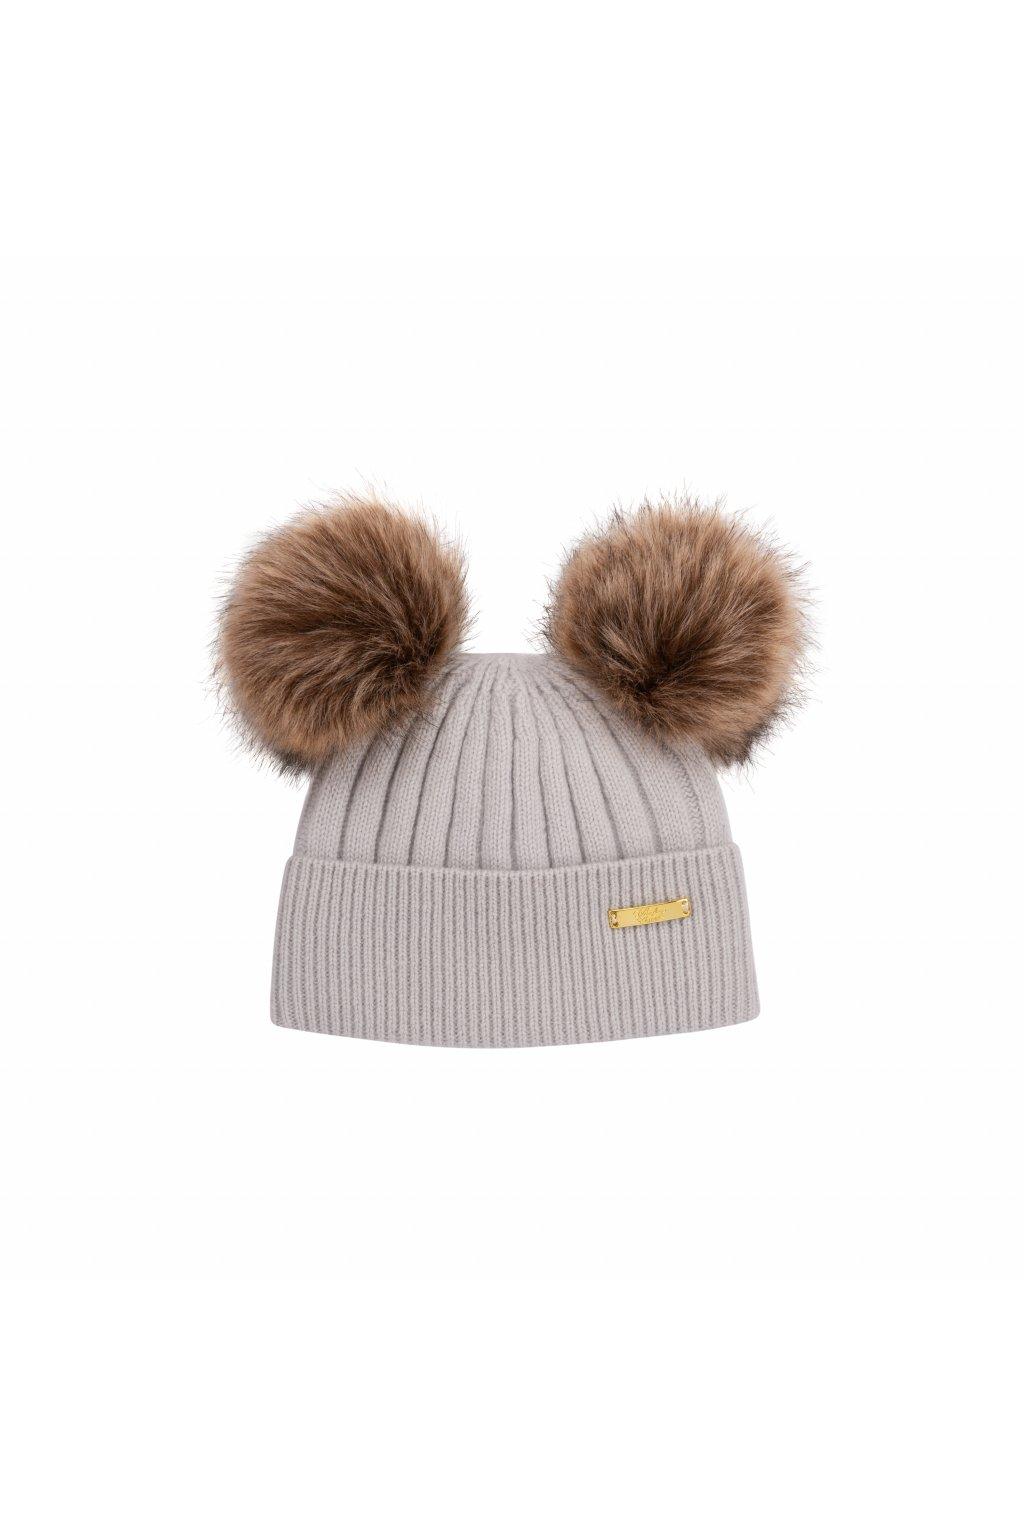 Winter hat Grey 1 2 years